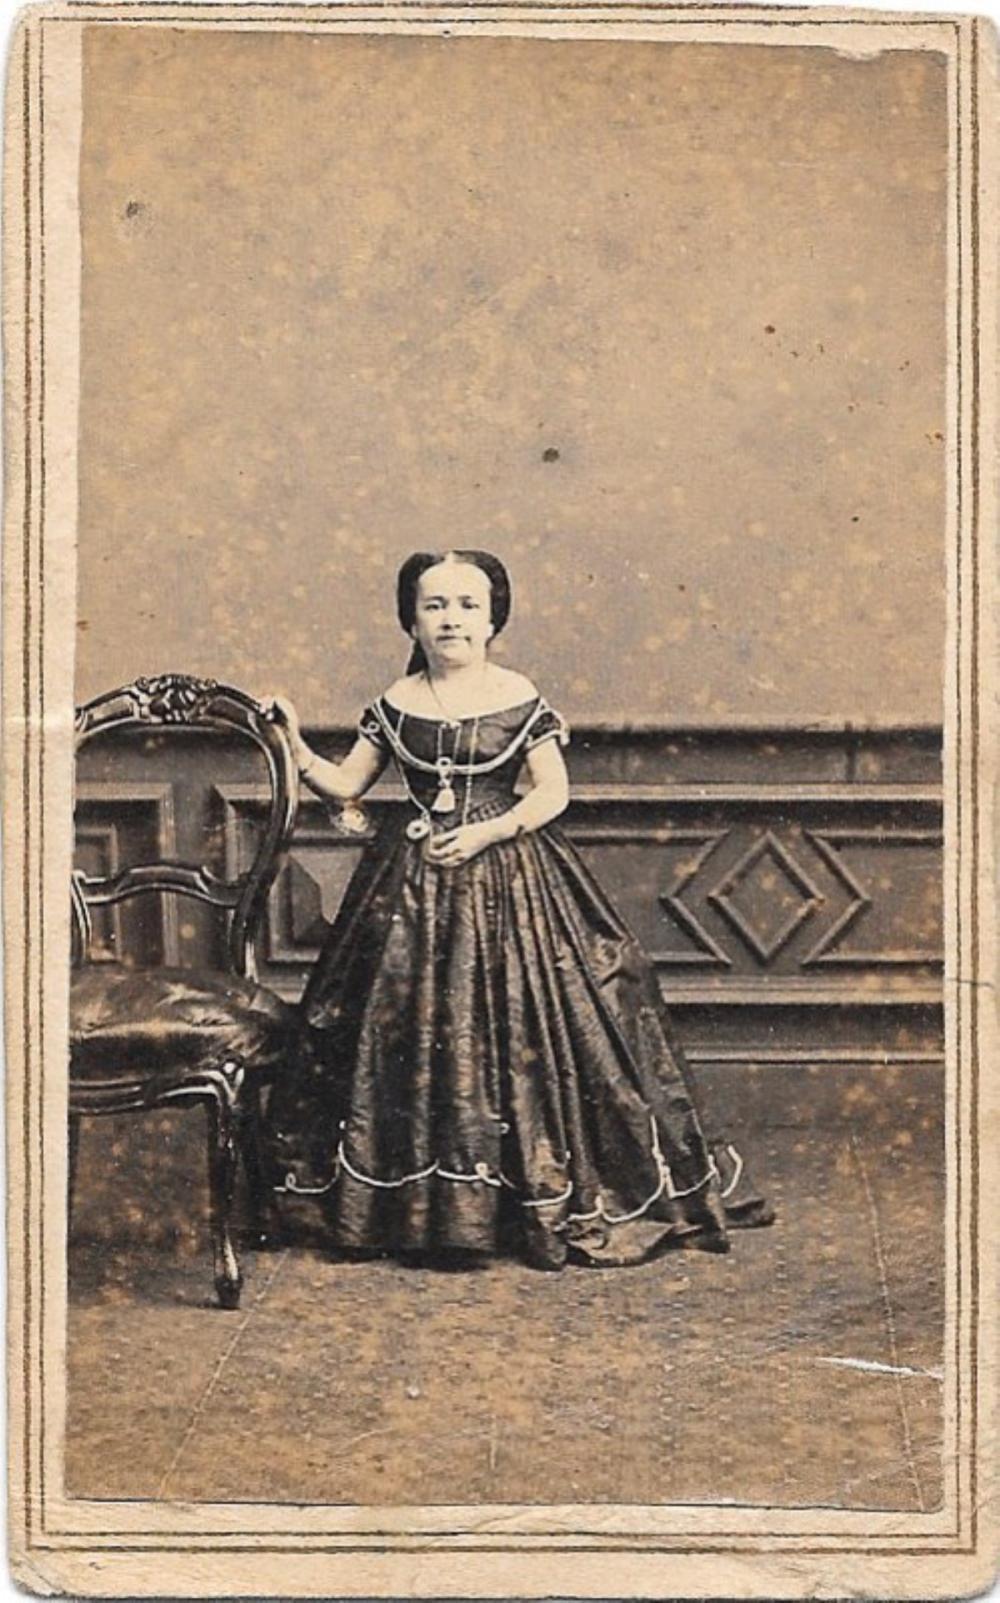 CDV of Lavinia Warren, wife of General Tom Thumb